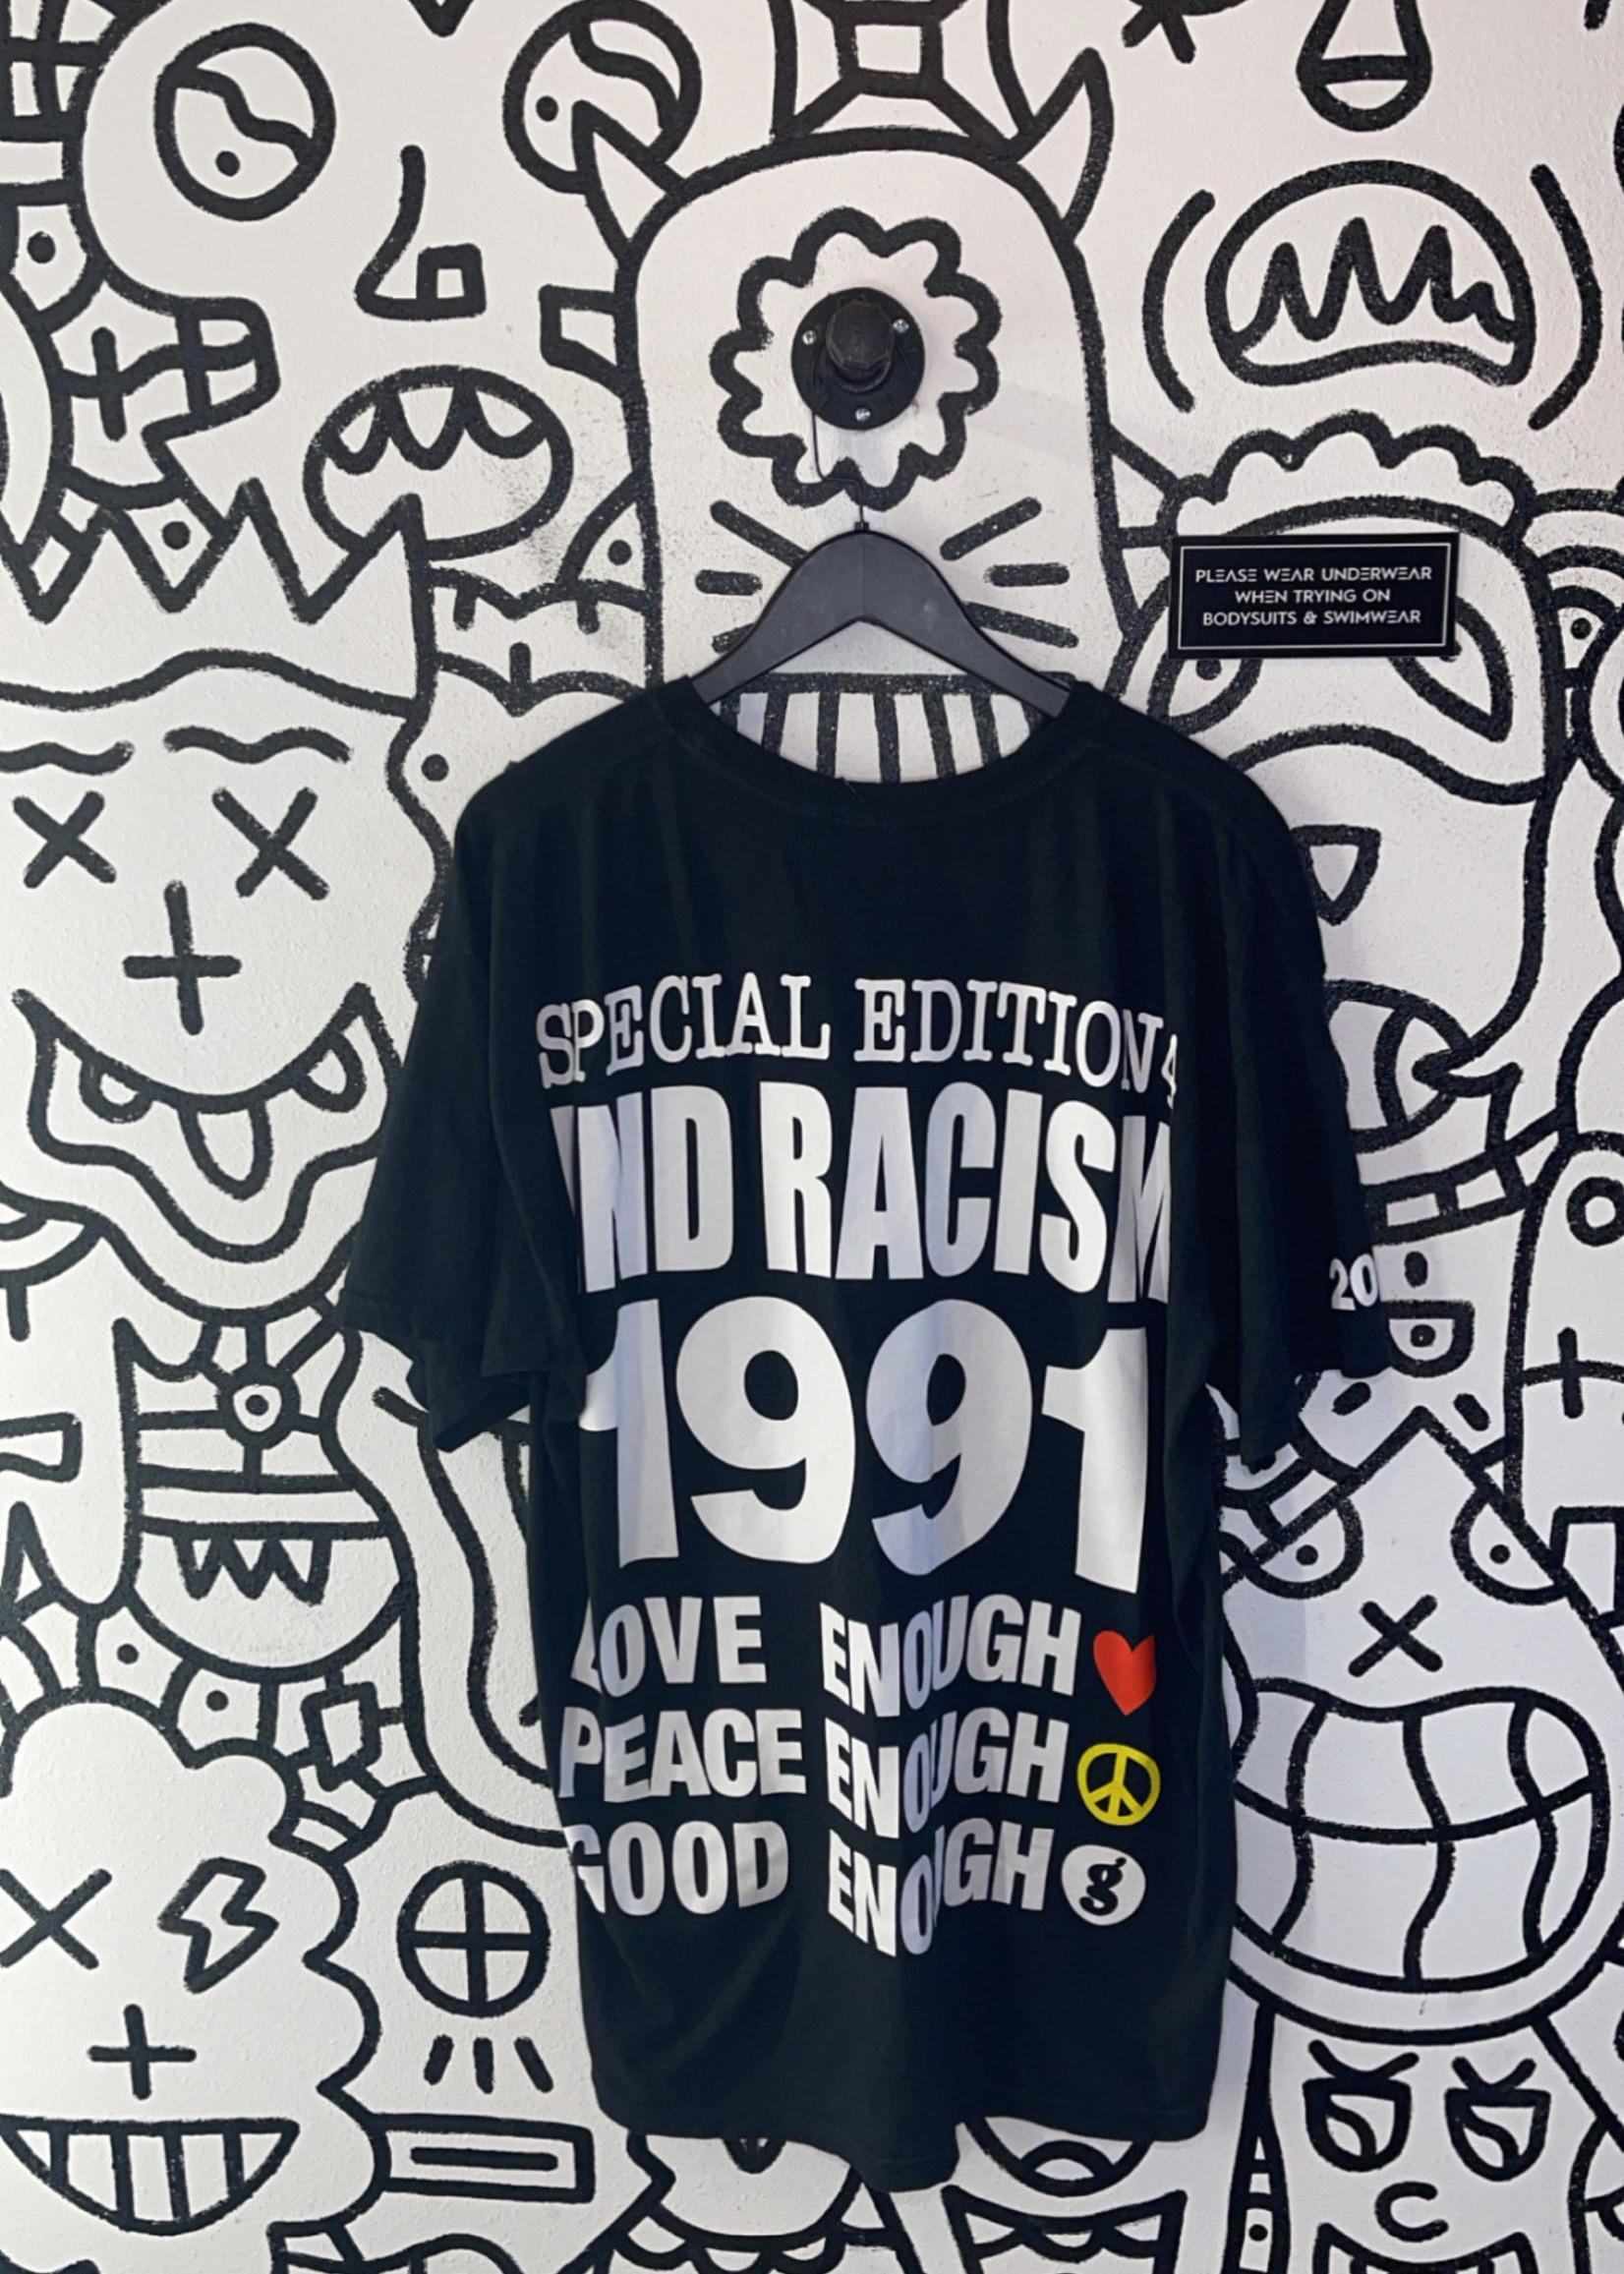 Fragment Design × Infinite Archives End Racism Black Tee XL